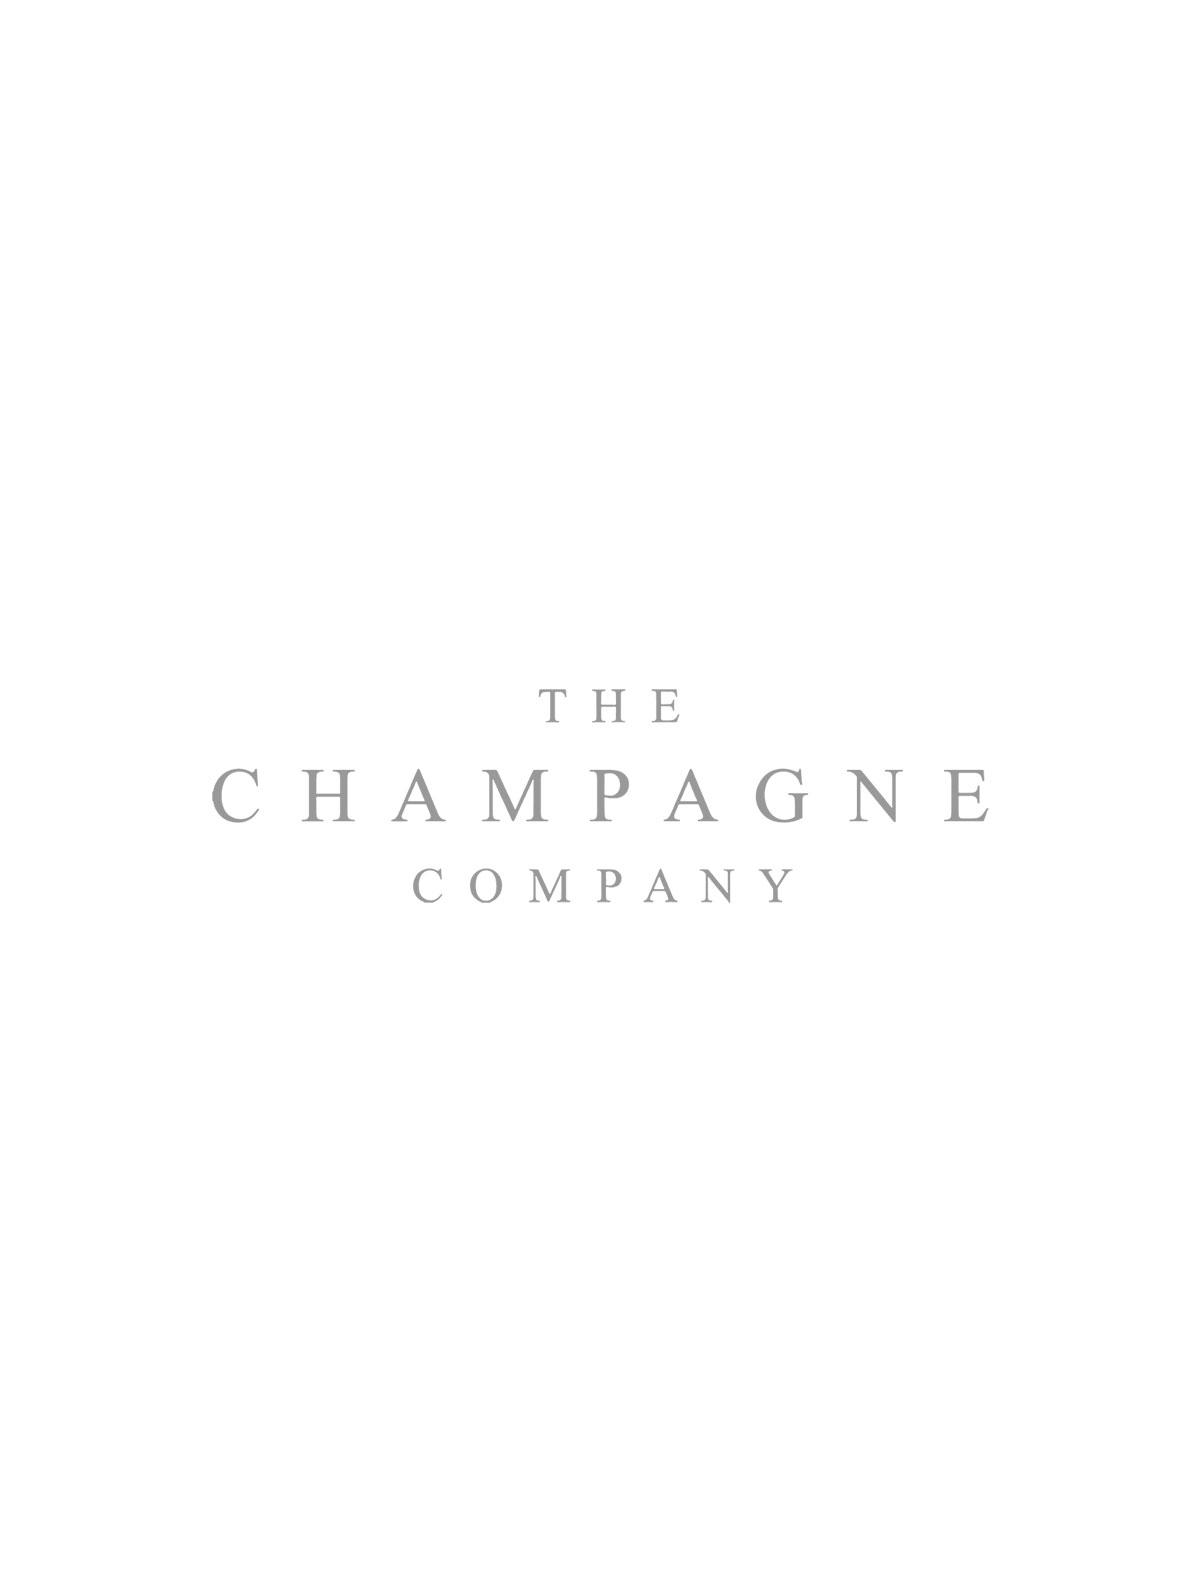 Pommery Grand Cru 2000 Vintage Champagne 75cl